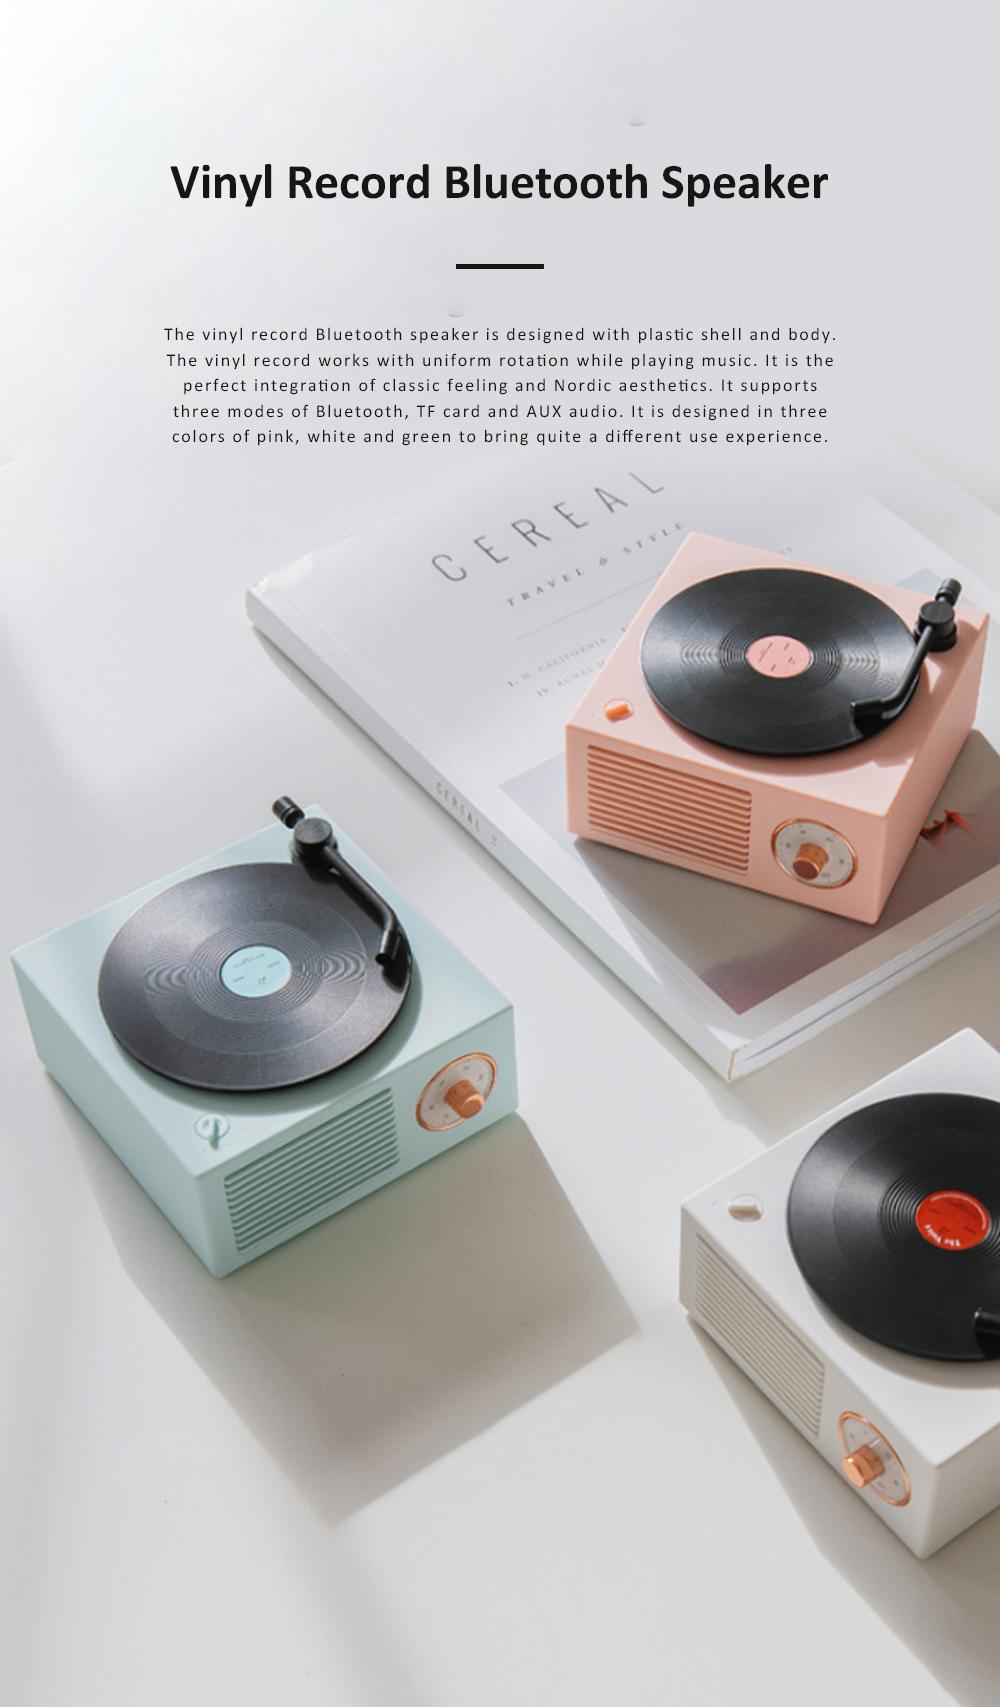 Retro Vinyl Record Bluetooth Speaker Wireless Mini Subwoofer Portable Loudspeaker Box USB Rechargeable Baffle Box Nice Christmas Birthday Present 0